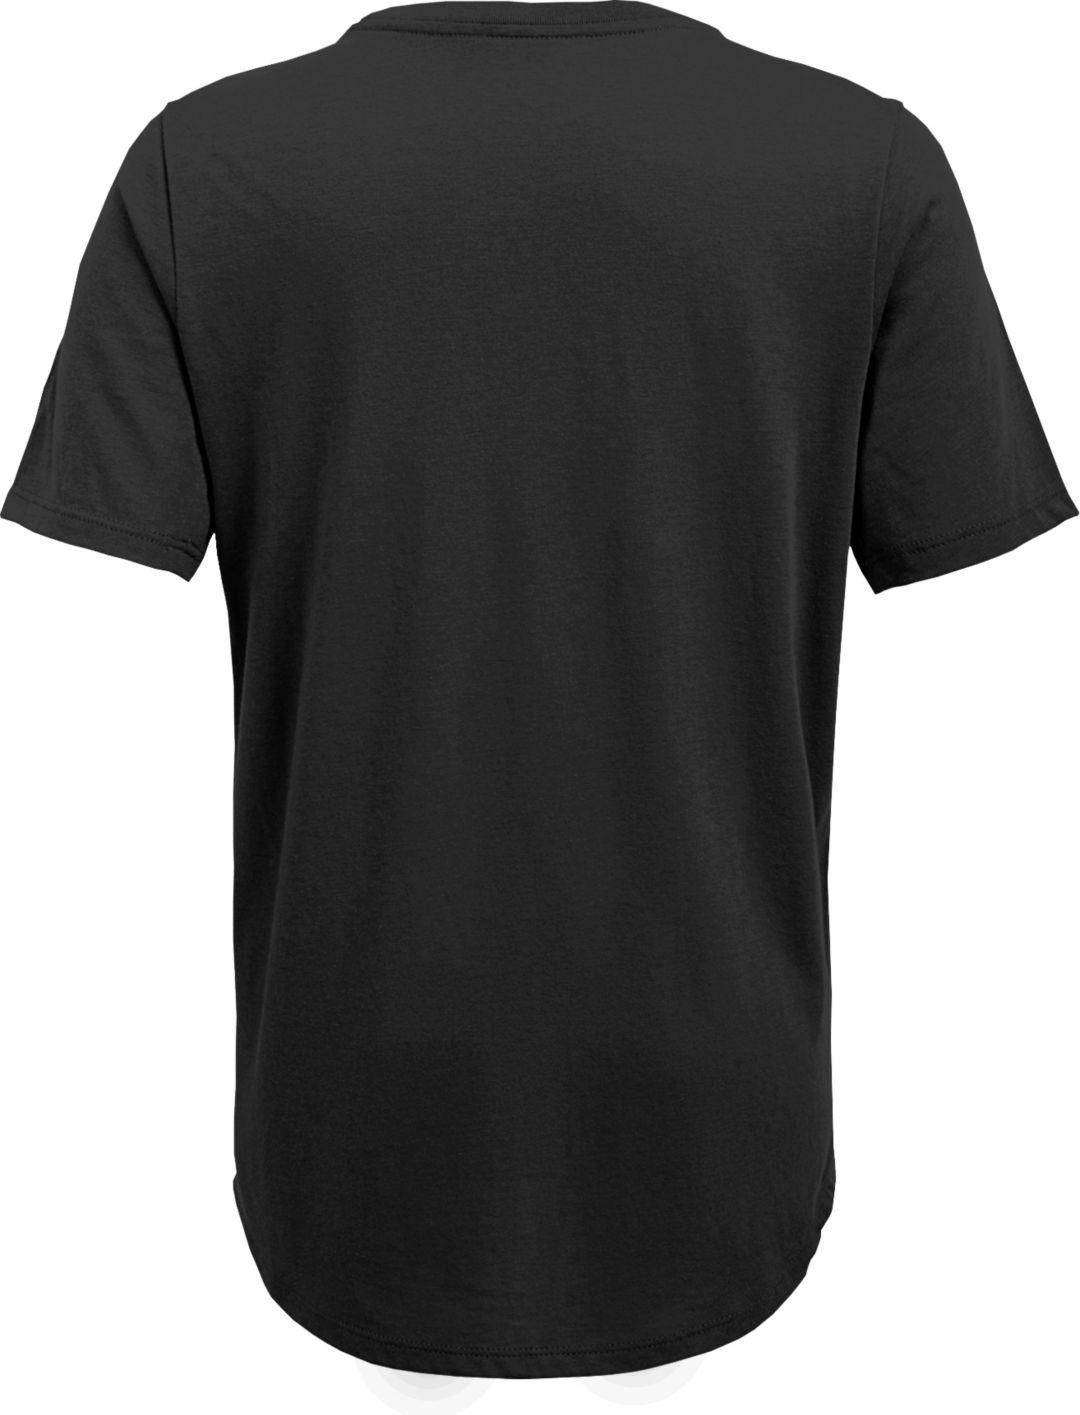 new arrivals ba66b 10976 NFL Team Apparel Youth Pittsburgh Steelers Ultra Black T-Shirt